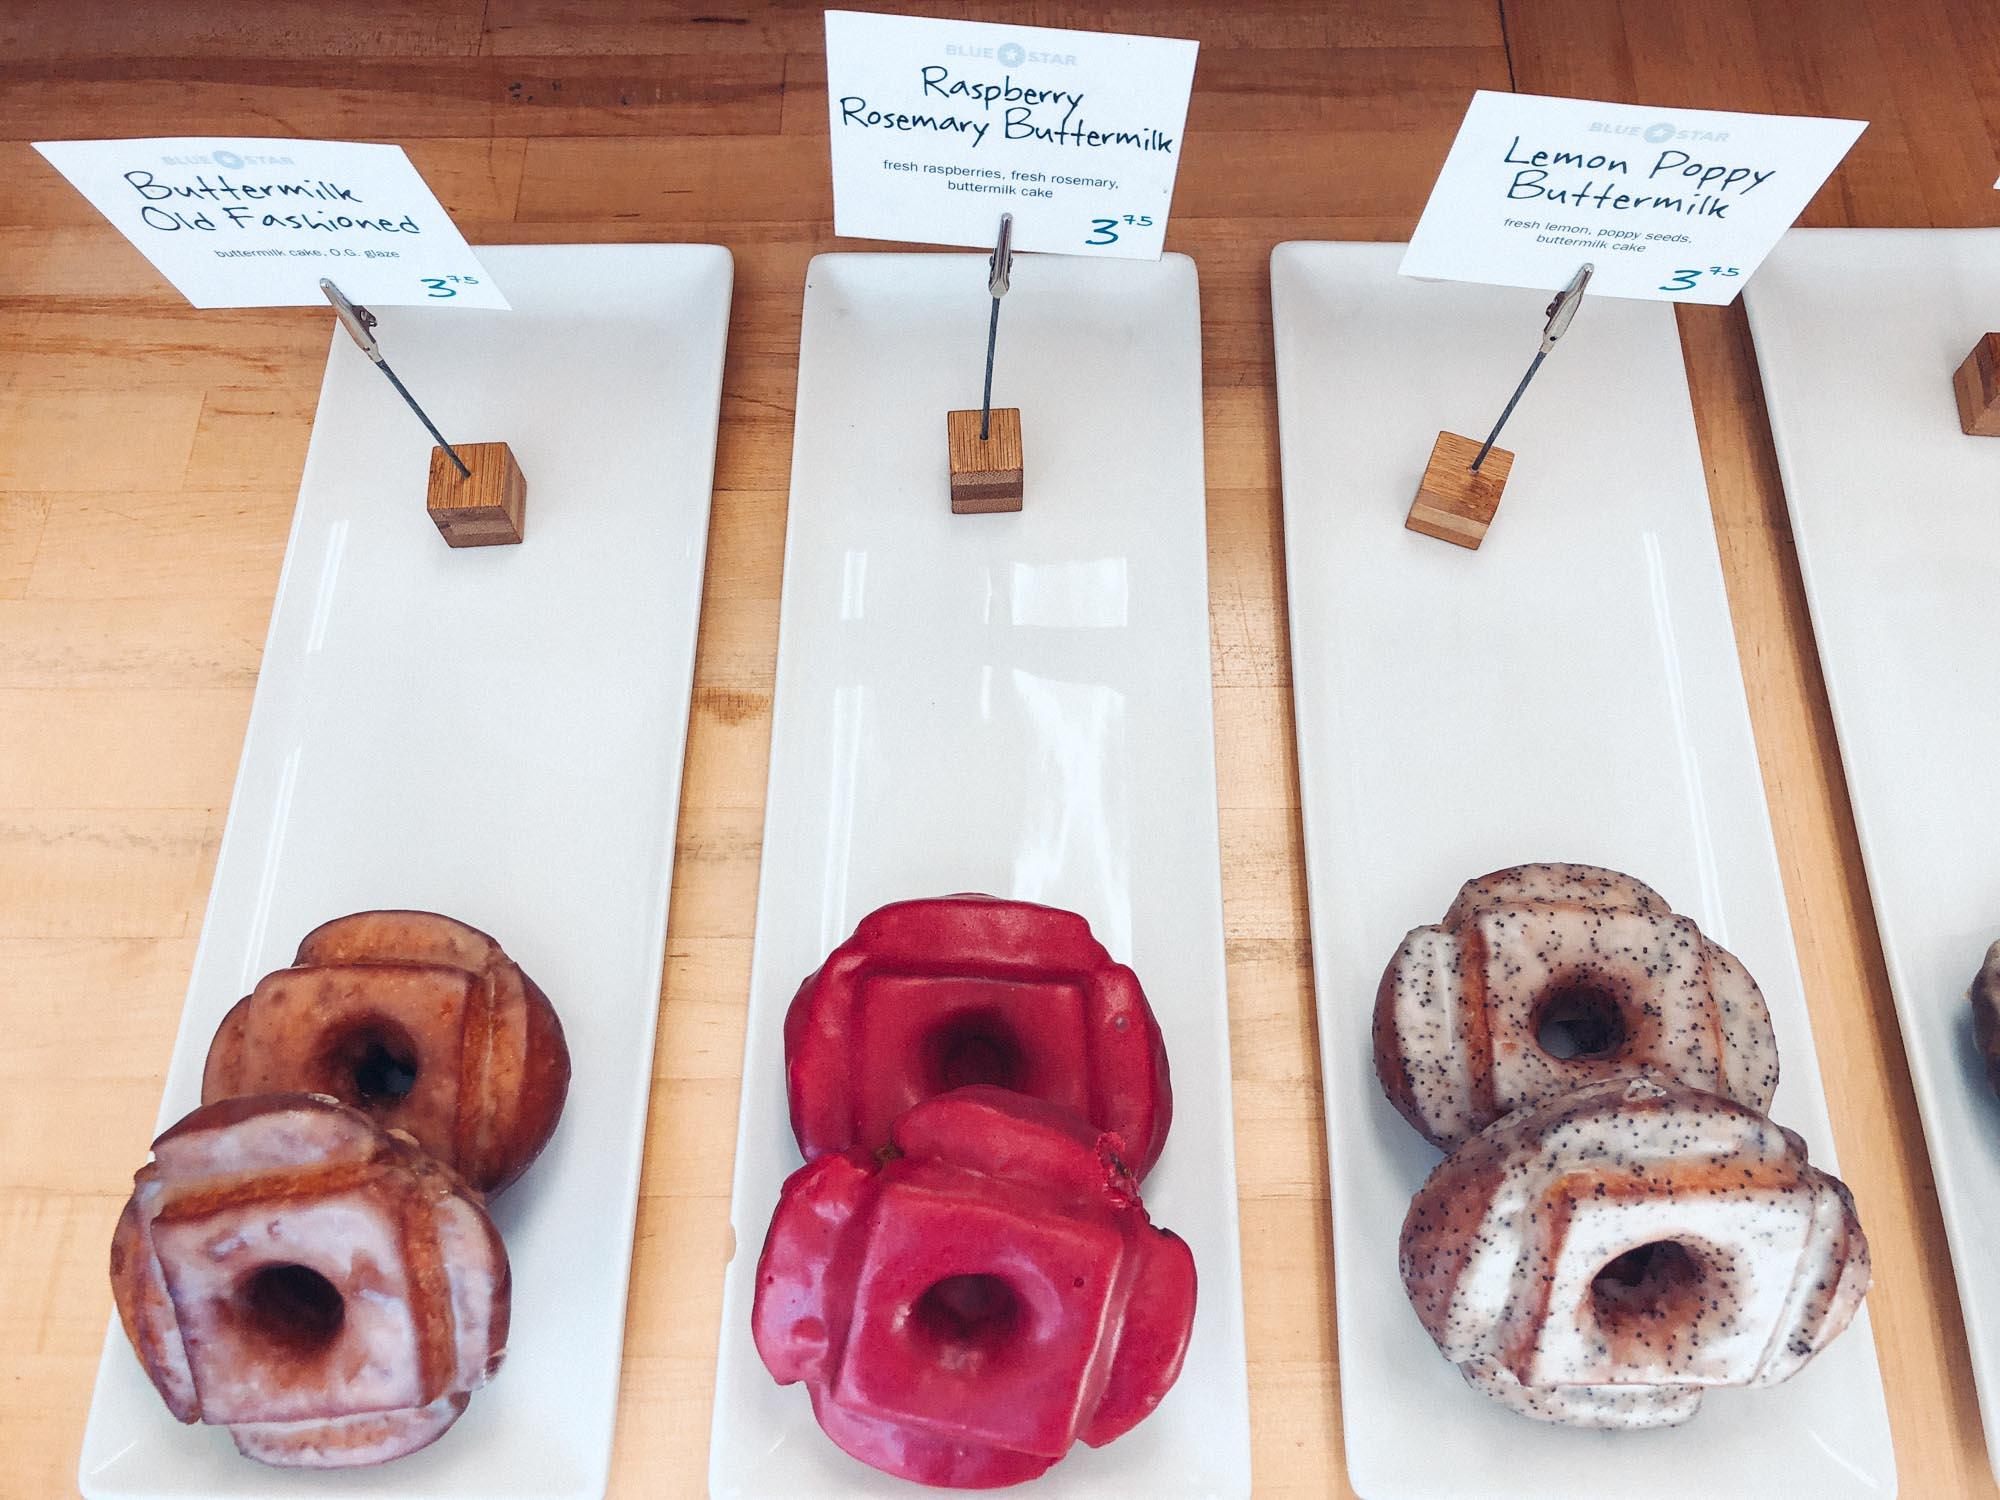 Best vegetarian restaurants in Portland - Blue Star Donuts